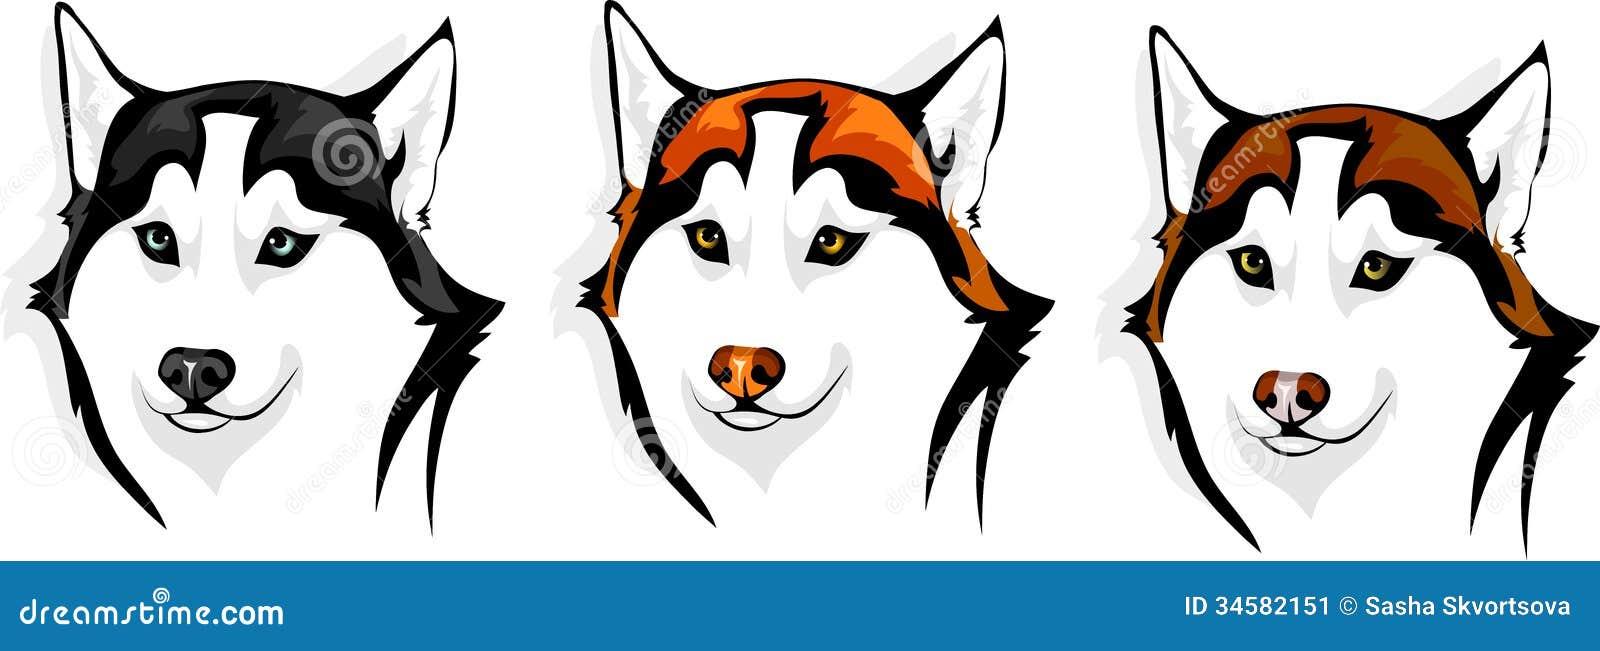 Husky - Wolf Stock Image - Image: 34582151